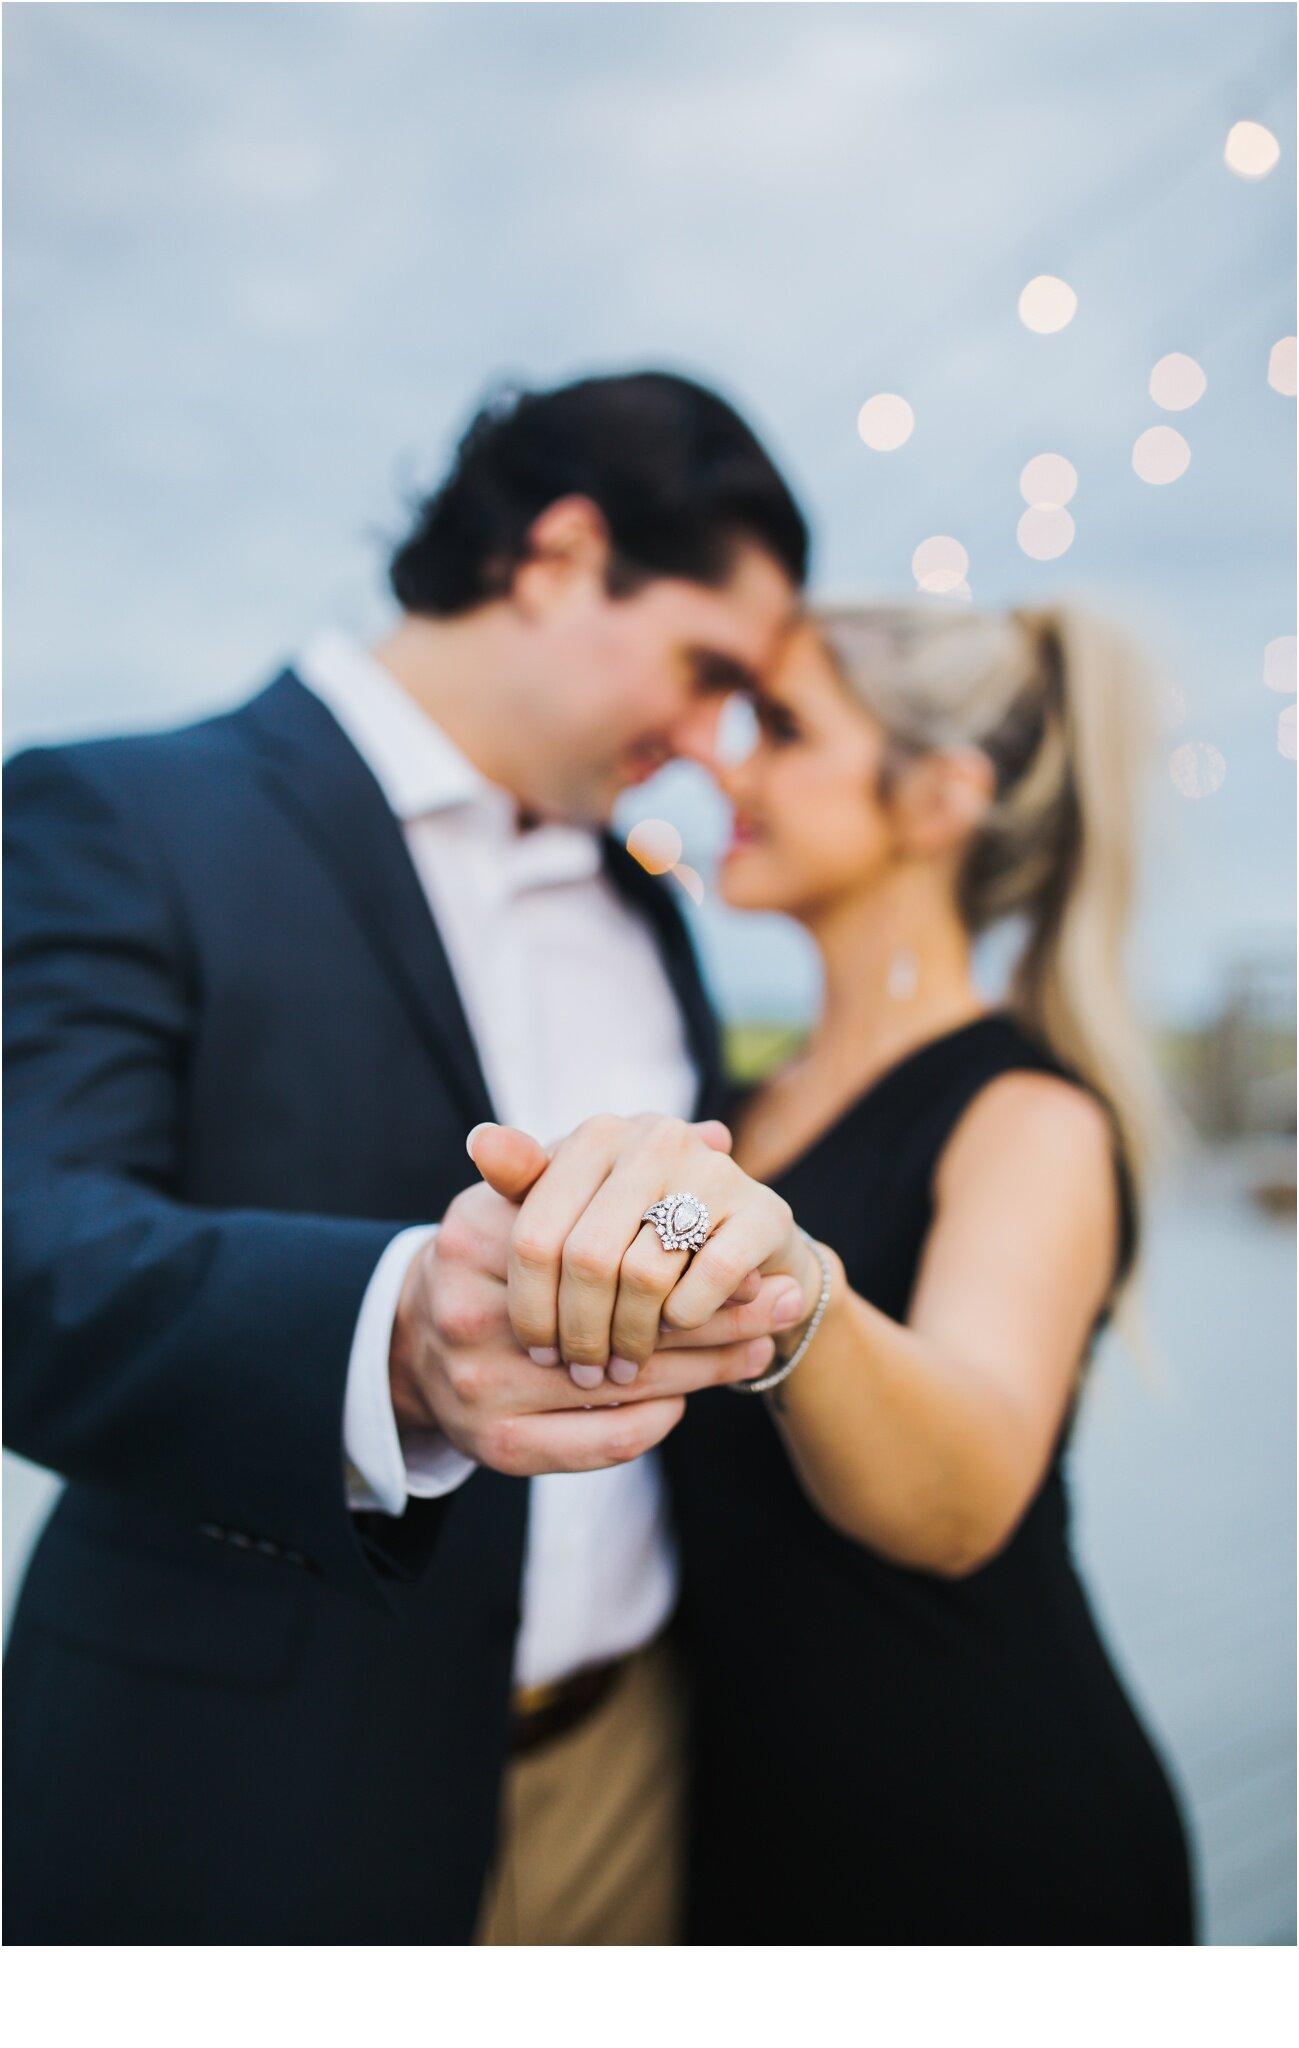 Rainey_Gregg_Photography_St._Simons_Island_Georgia_California_Wedding_Portrait_Photography_1844.jpg